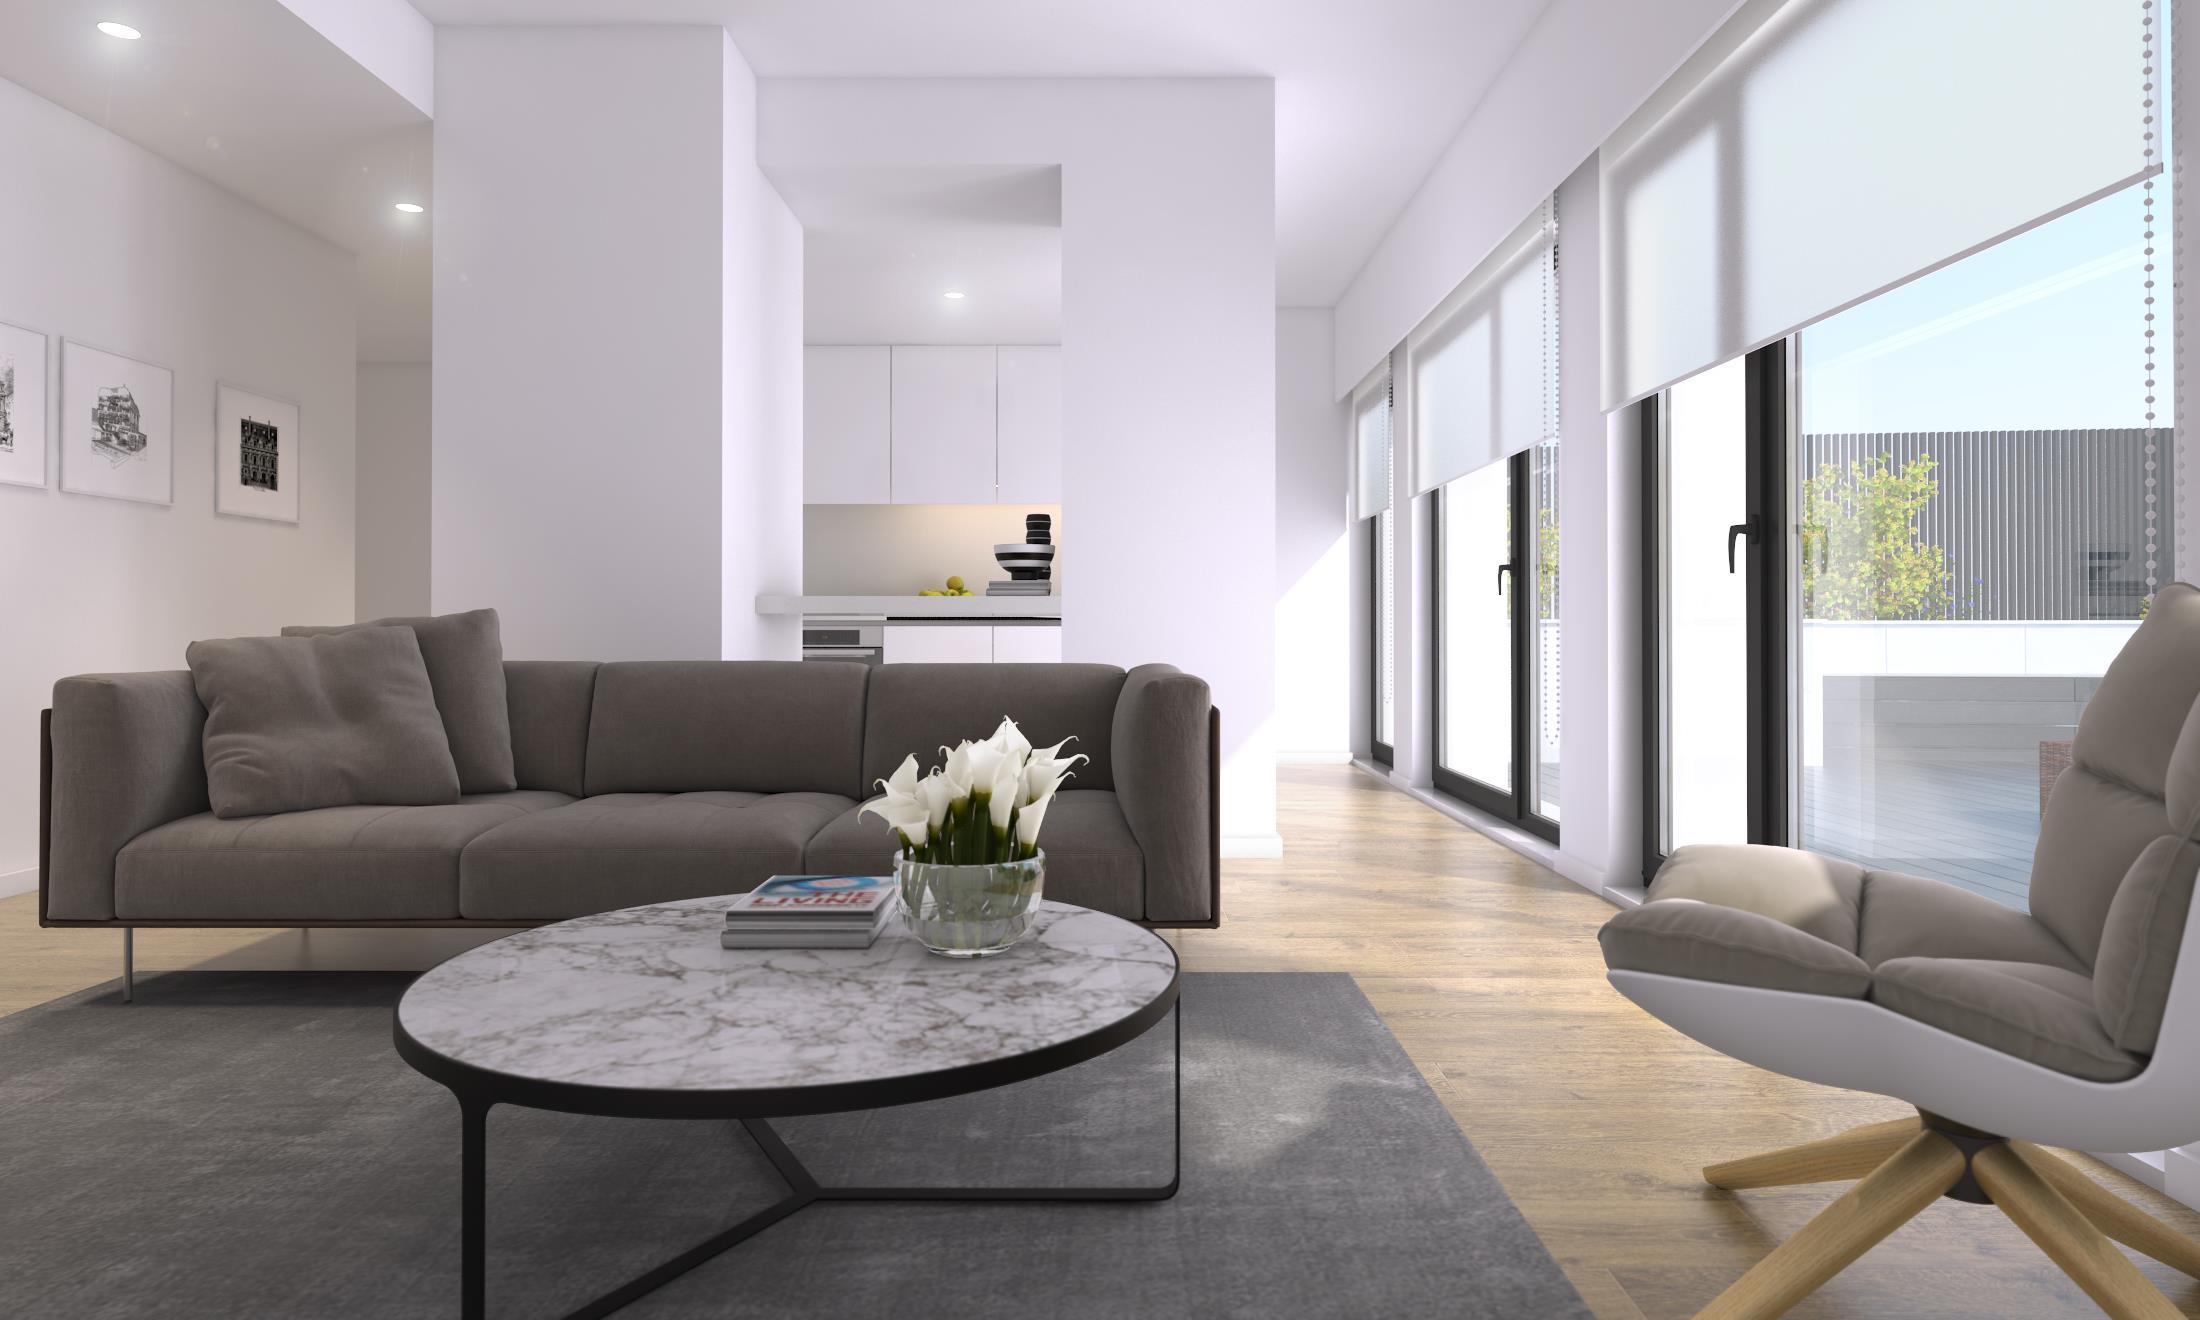 Apartment for Sale at Flat, 2 bedrooms, for Sale Lisboa, Lisboa, Portugal